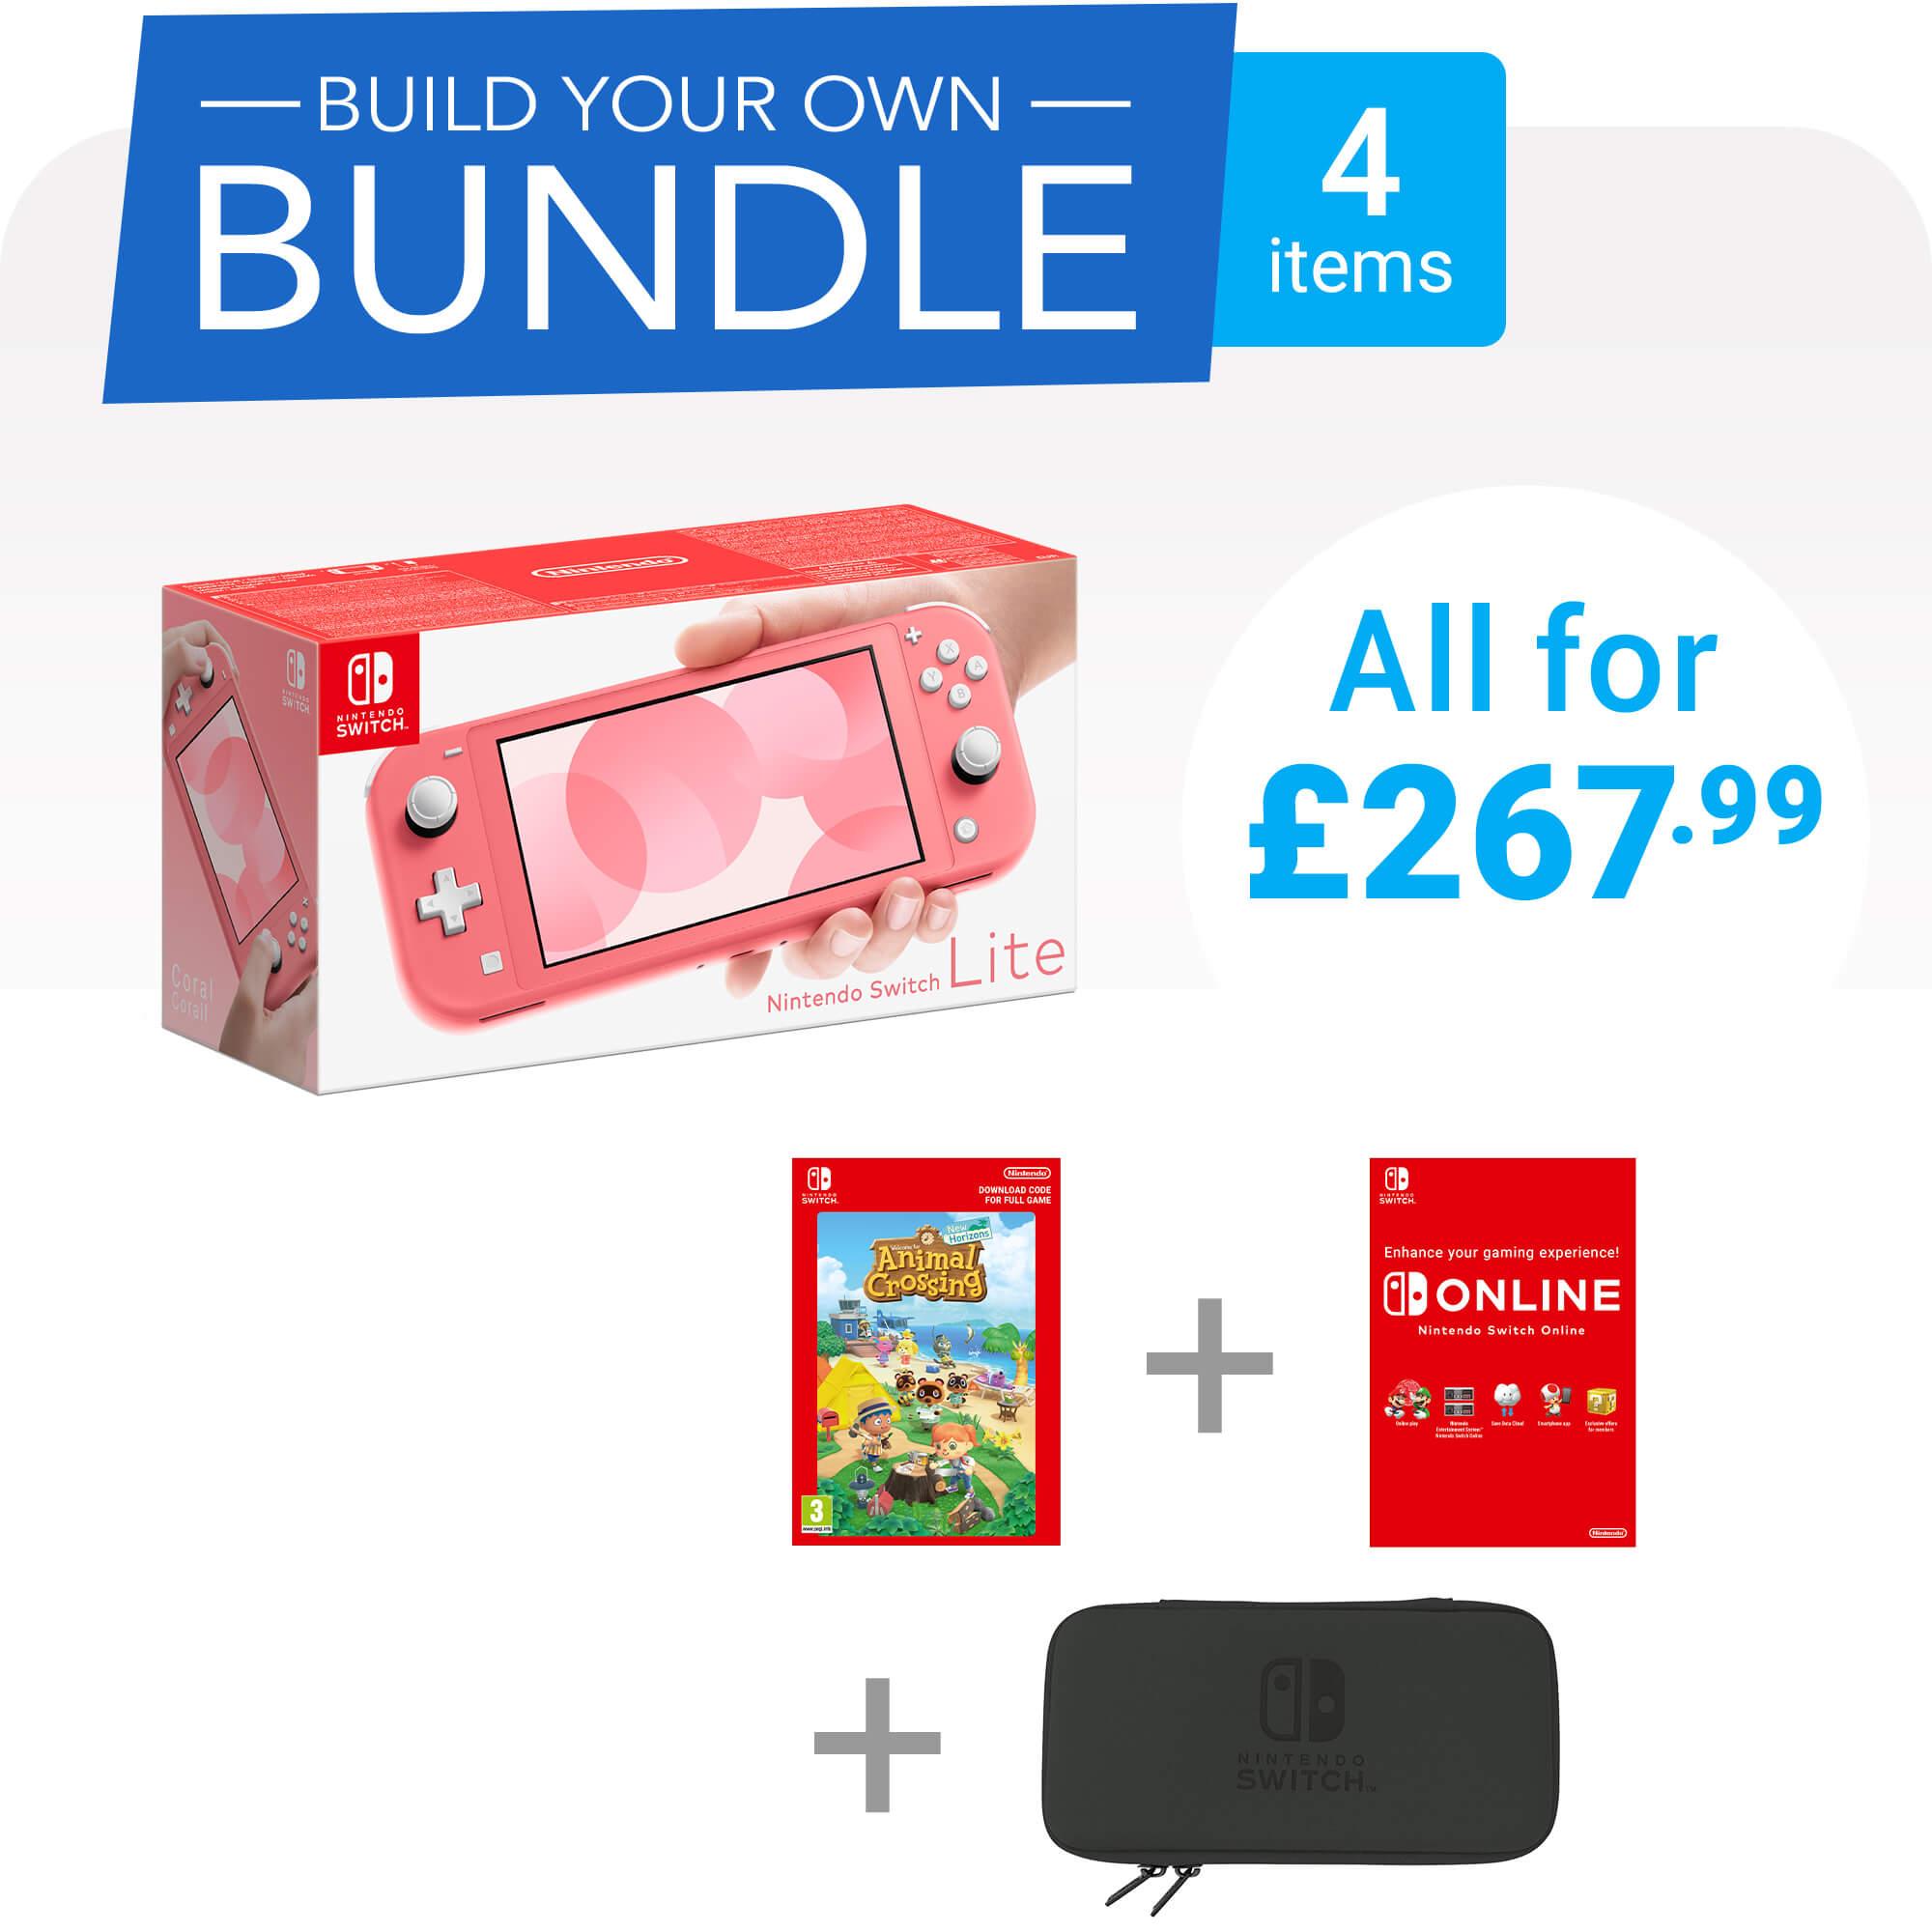 Build Your Own Nintendo Switch Lite Bundle - 4 items - £267.99